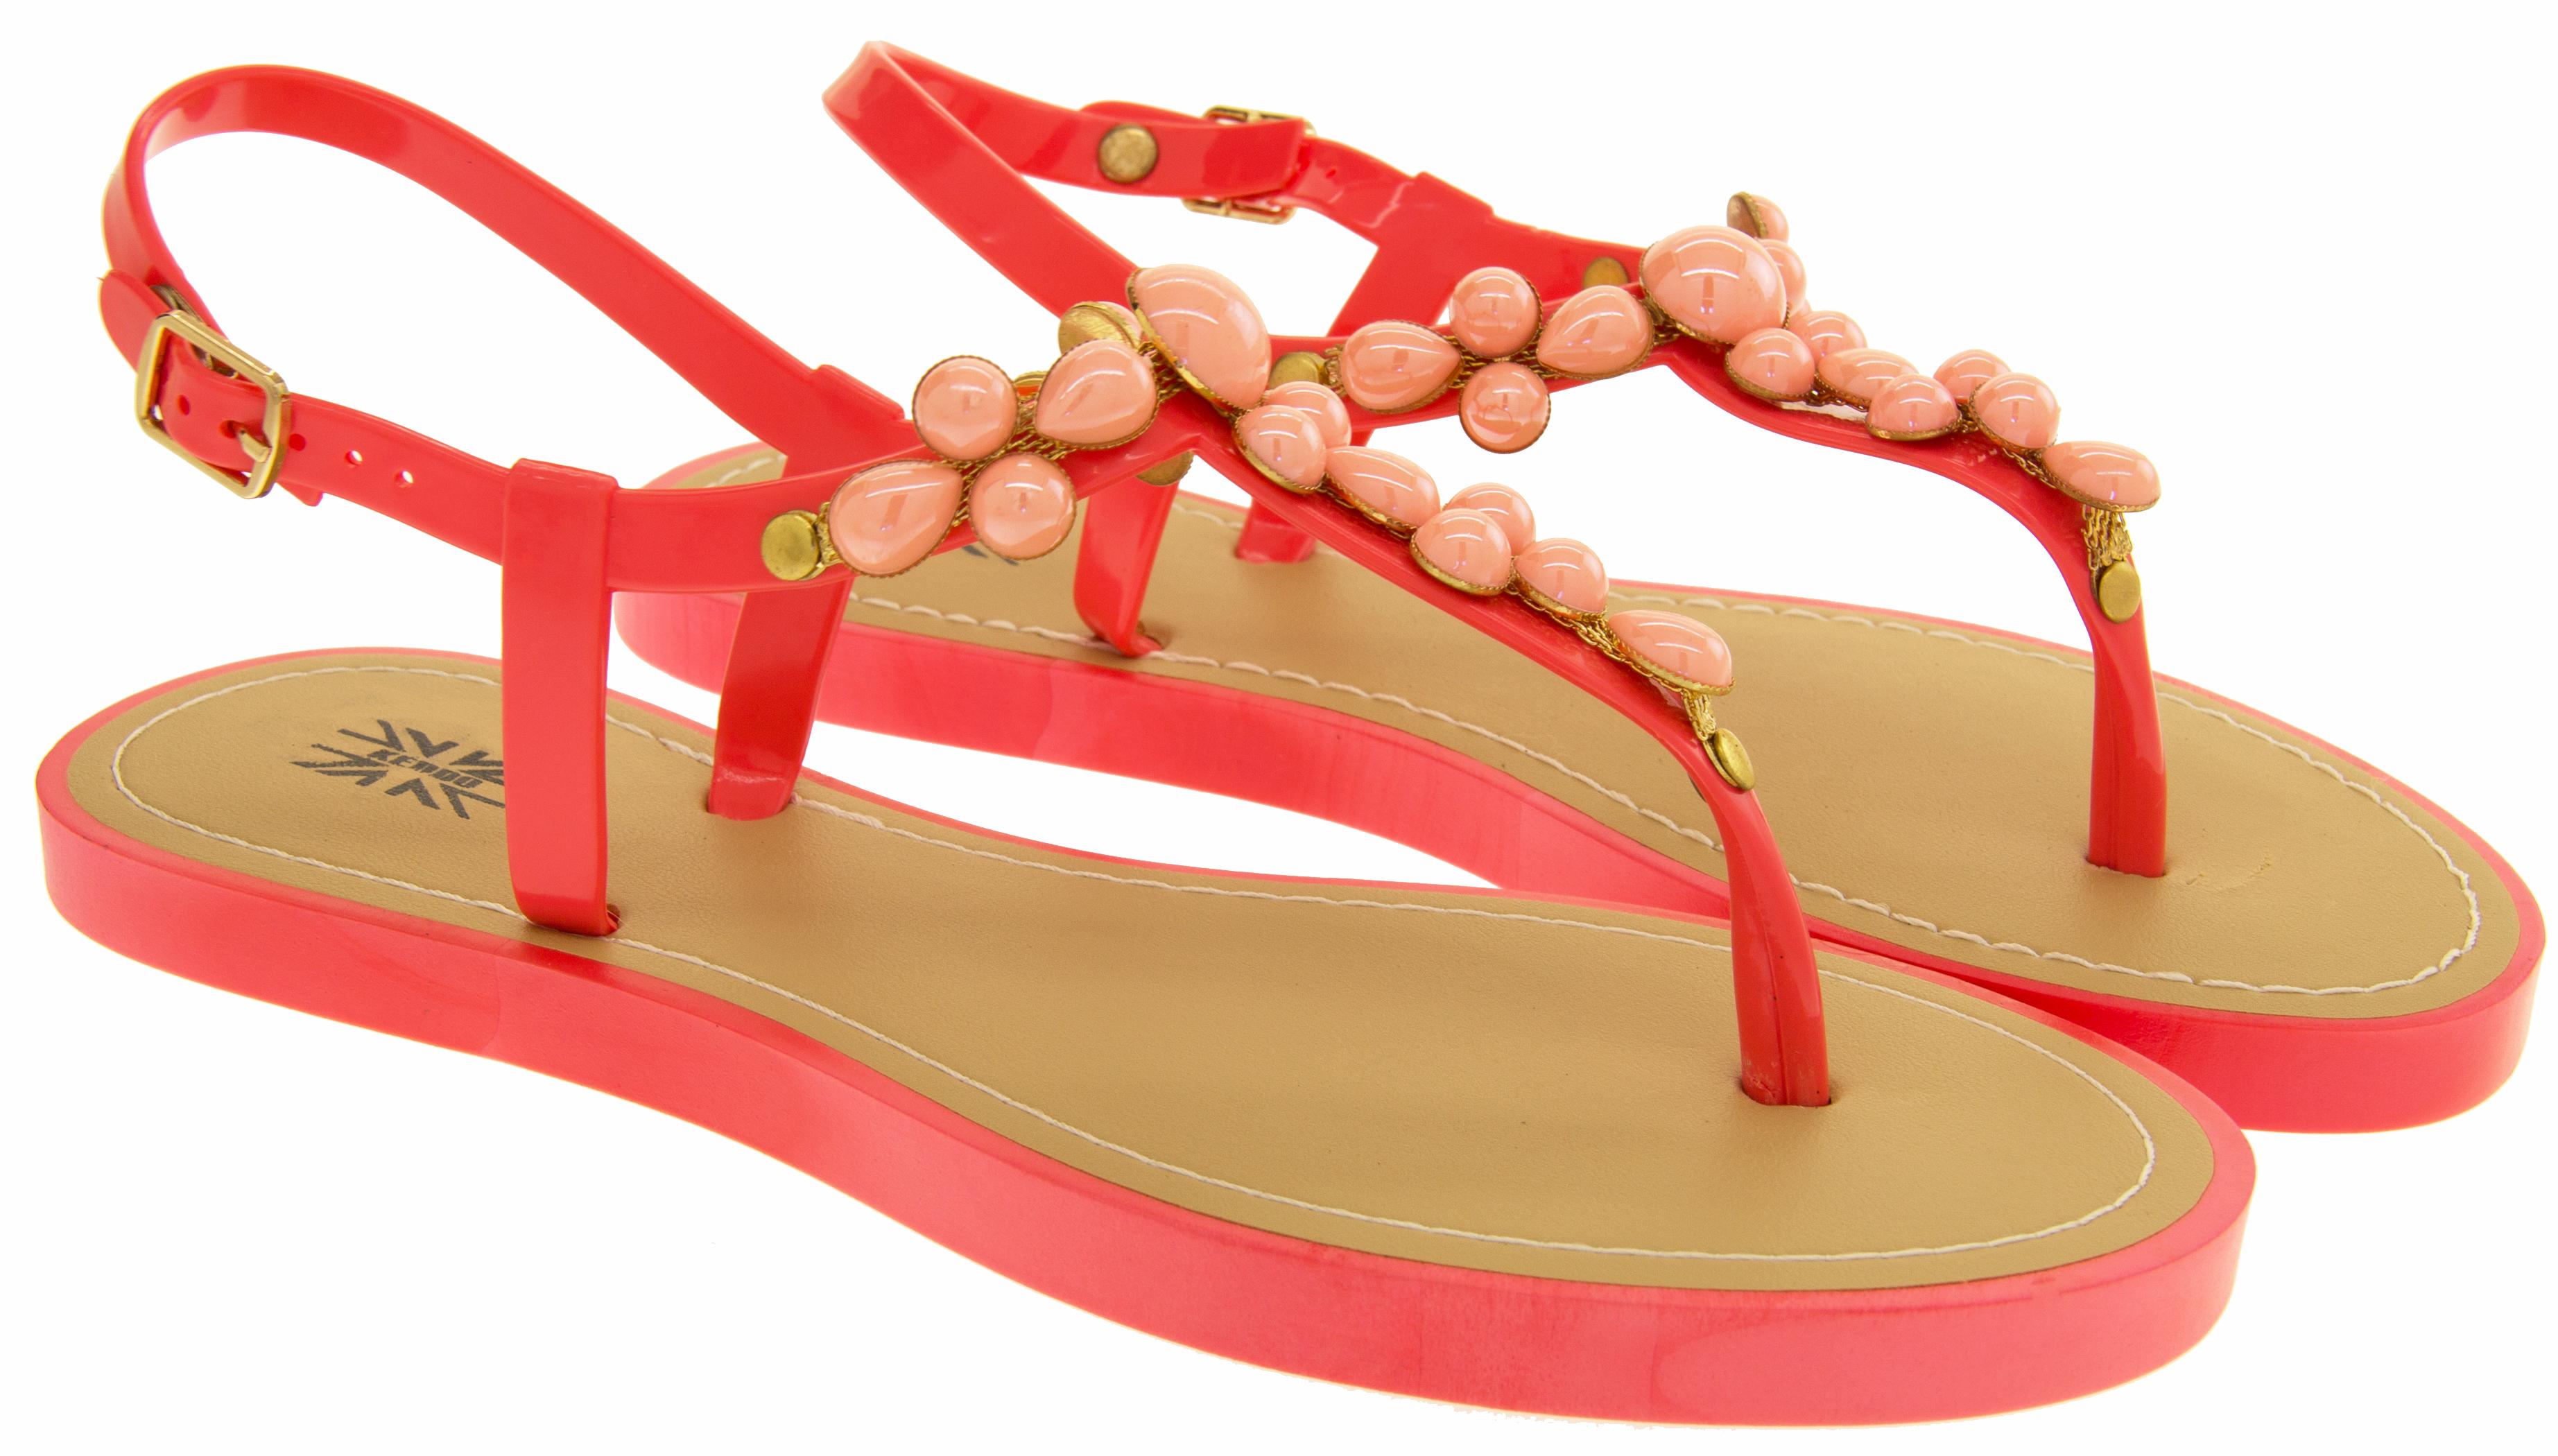 ladies open summer sandals womens toepost summer flip. Black Bedroom Furniture Sets. Home Design Ideas